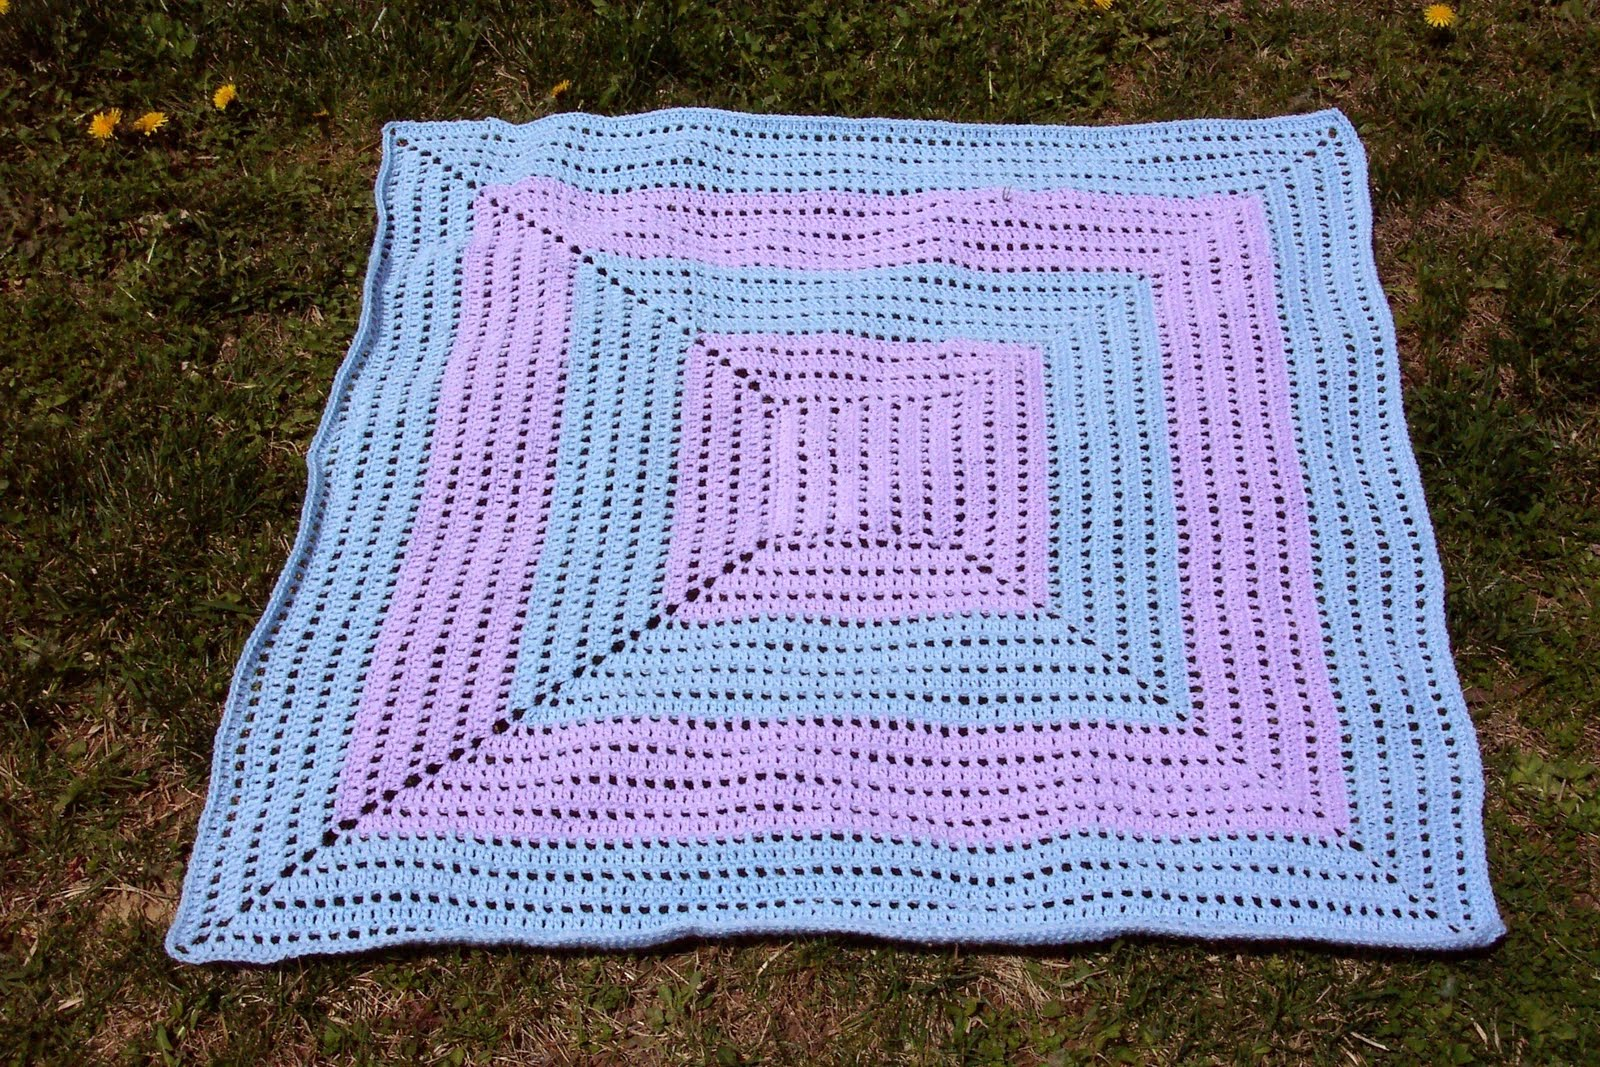 Smoothfox Crochet And Knit Smothfoxs A Whole Lotta Holes 12x12